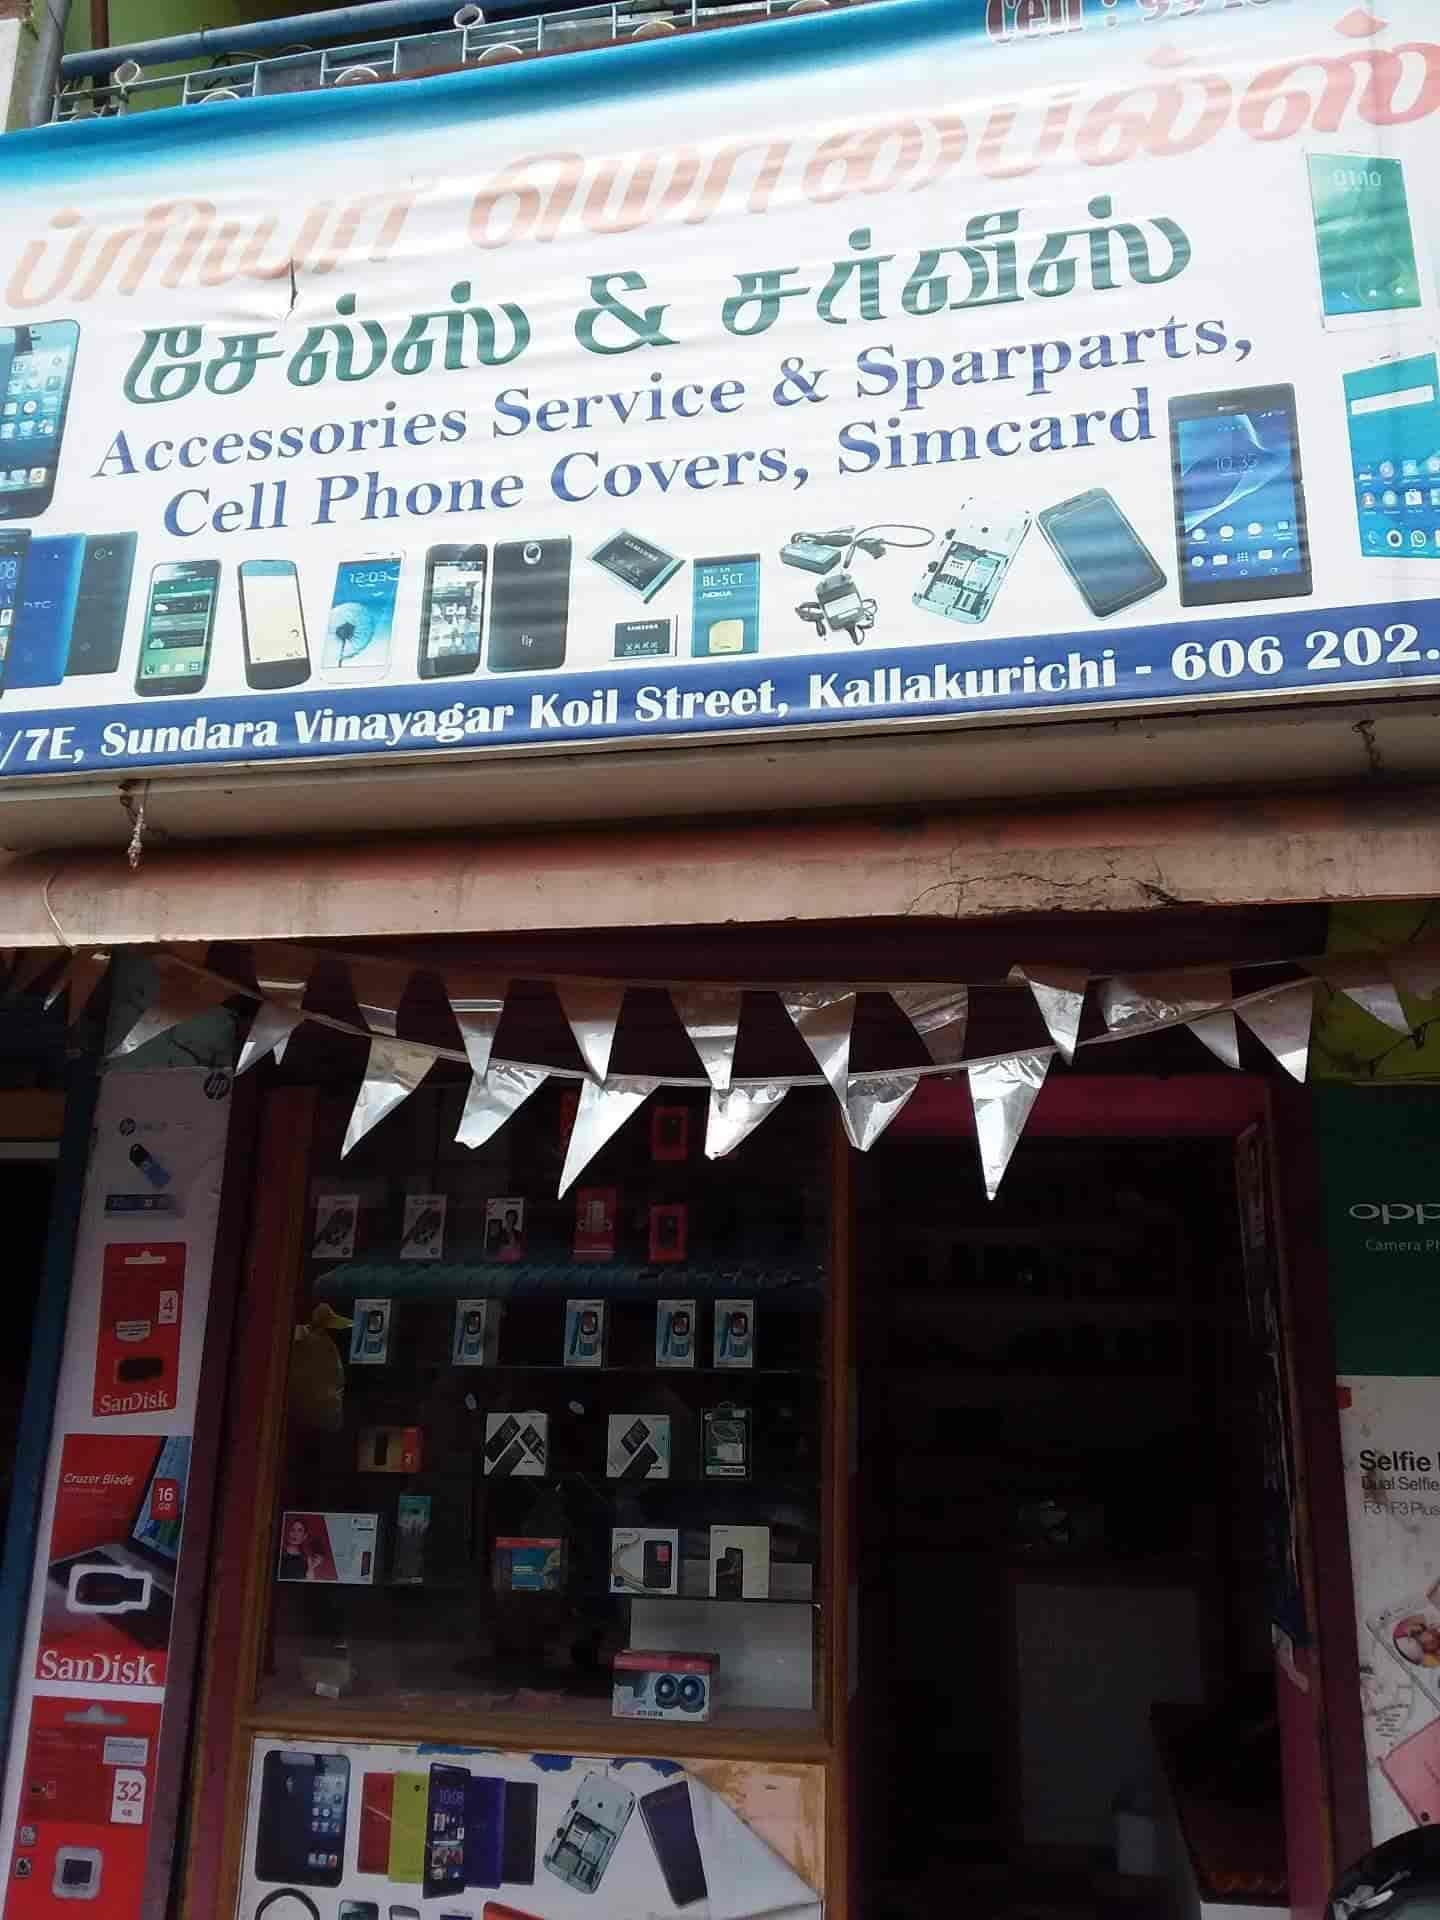 Priya Mobiles, Near Mahalakshmi Cinema - Mobile Phone